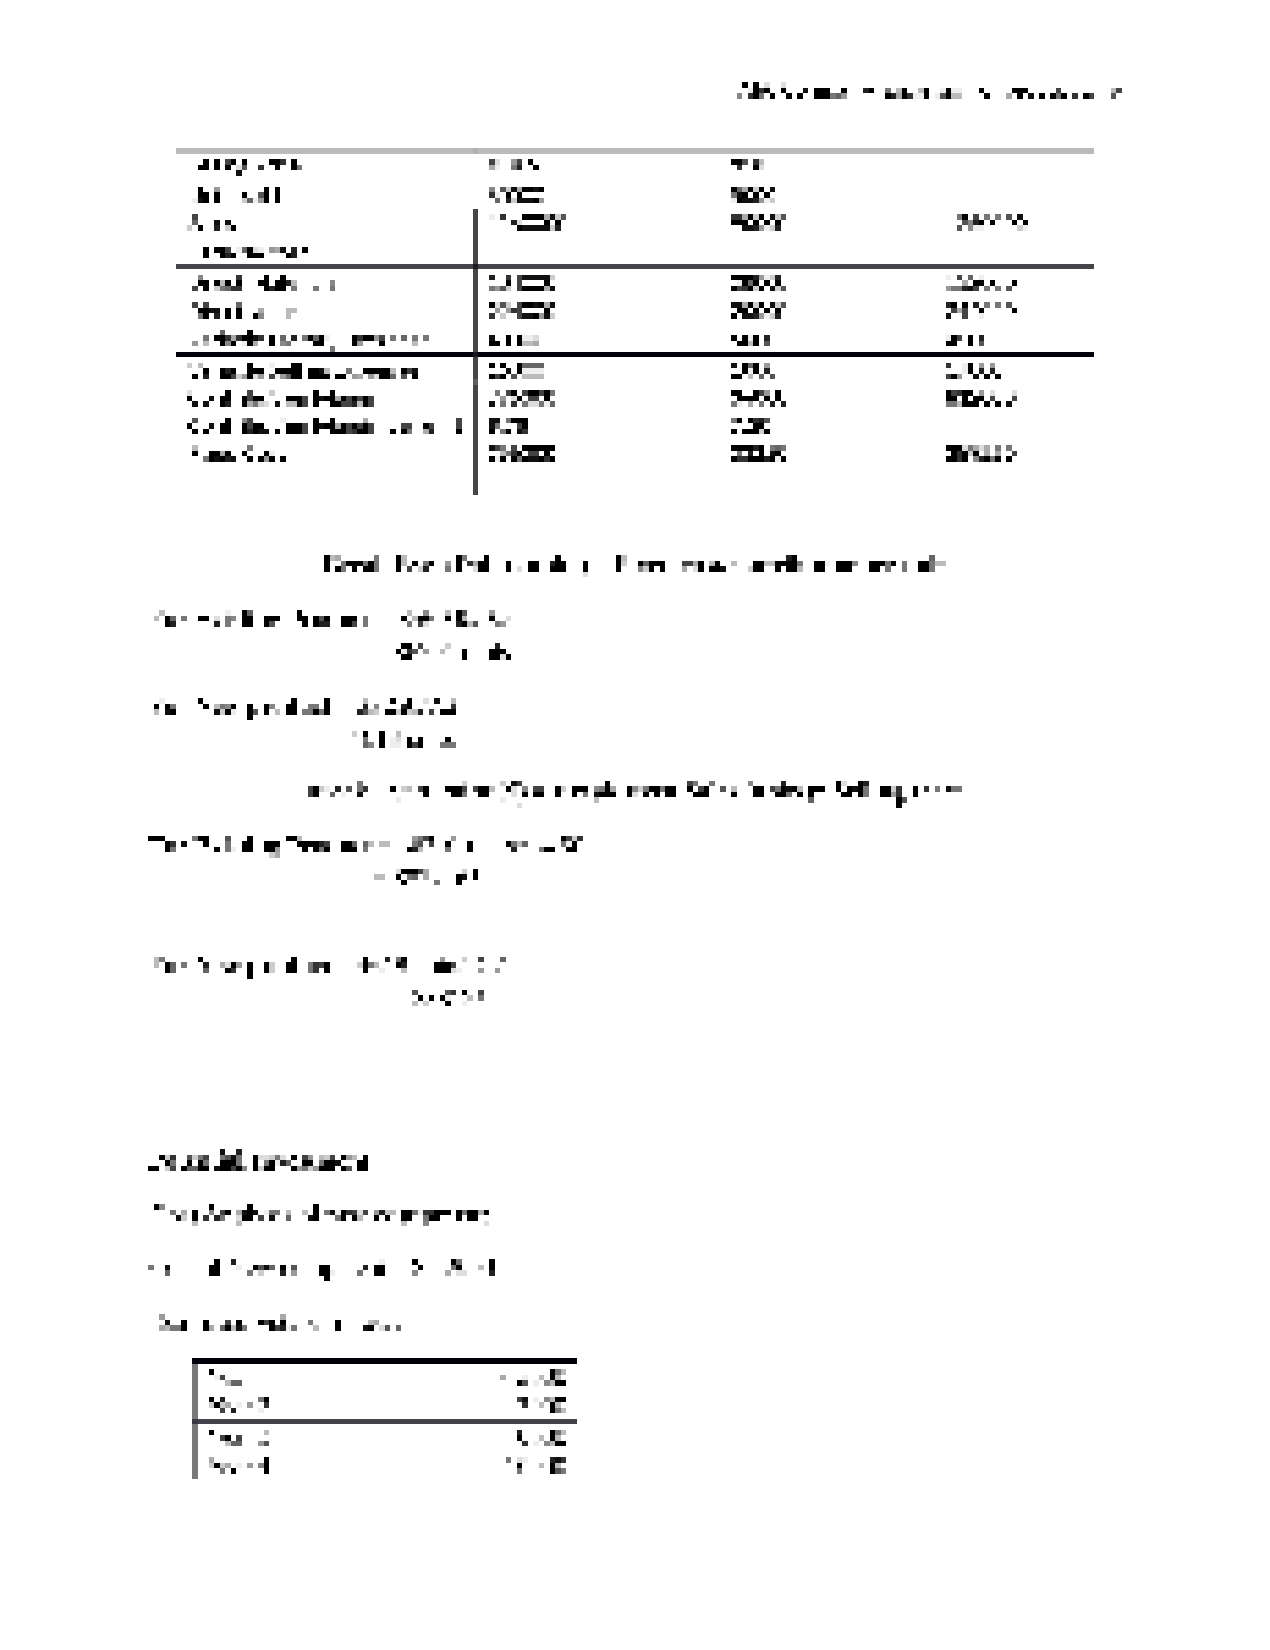 ACC 206 - Final Paper